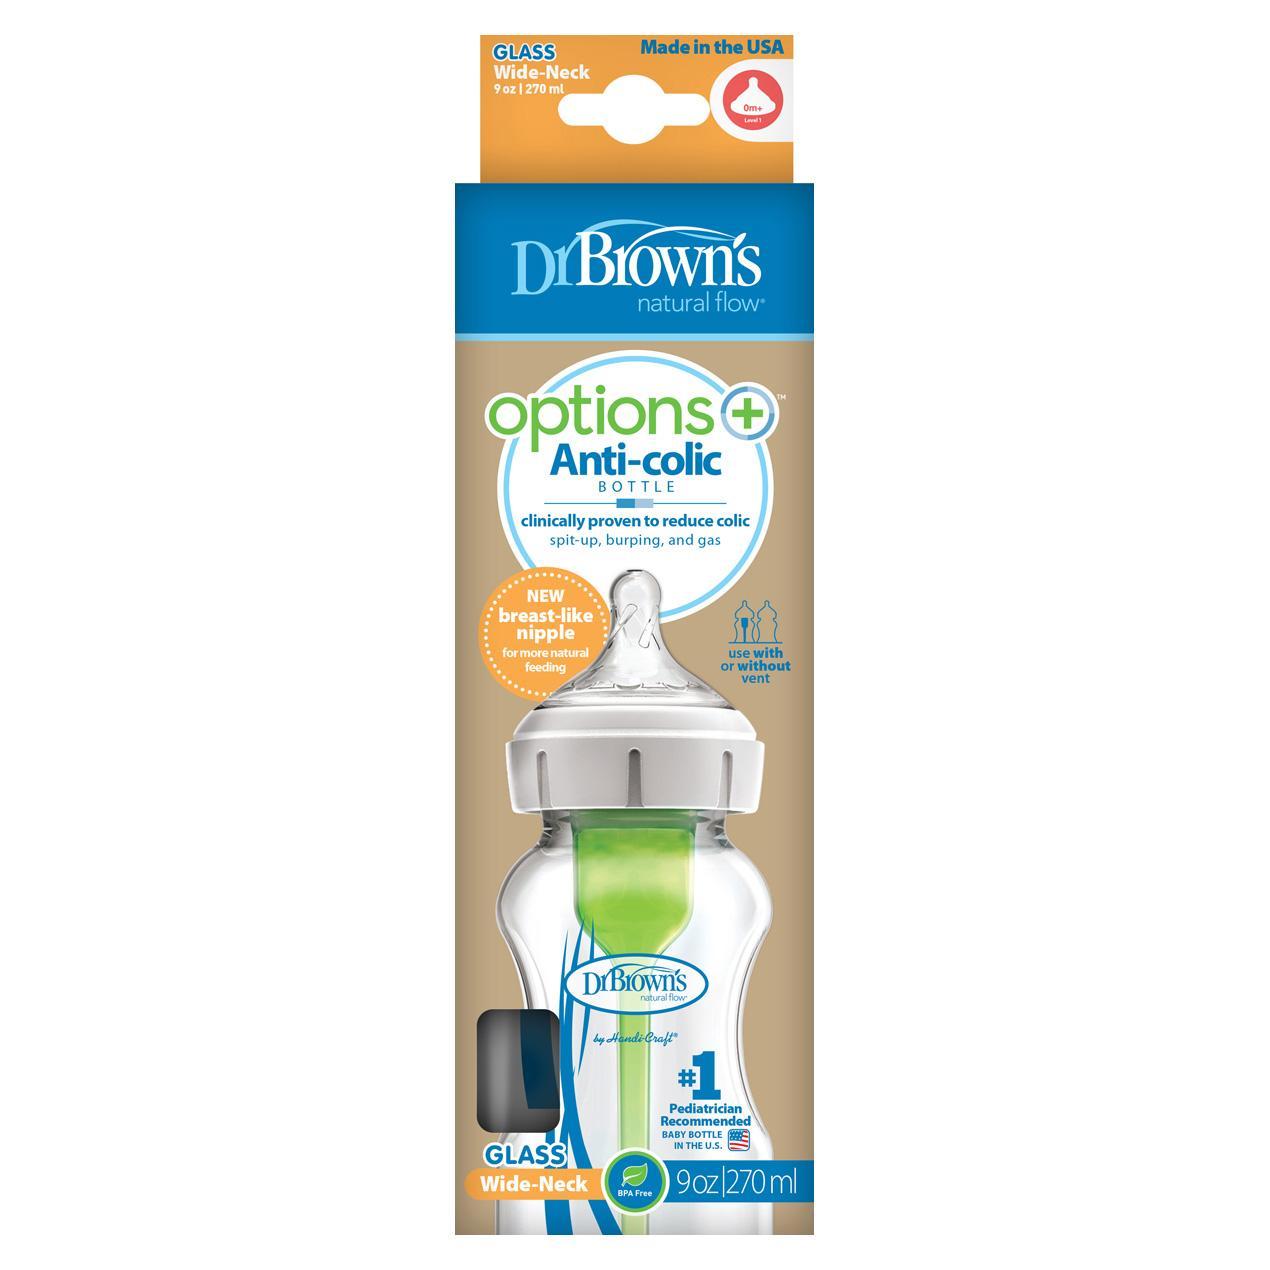 Dr.Brown´s Natural Flow Options+ Anti-colic Wide-Neck Glass Baby Bottle kojenecká láhev 270 ml